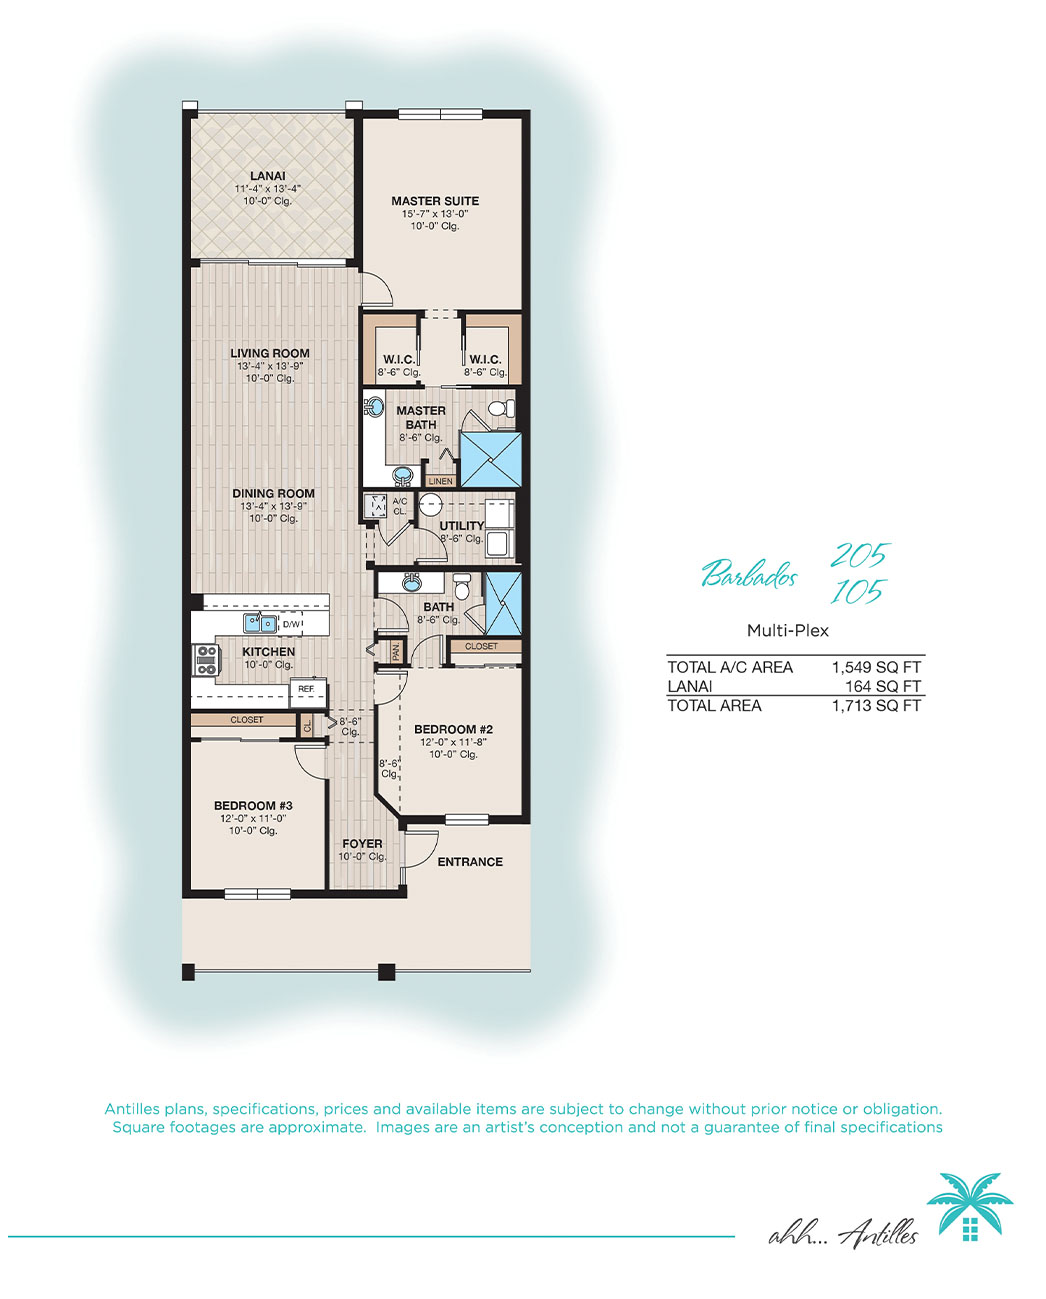 Multi-Plex Barbados 105 | Antilles of Naples, Florida - West Indies Styled Residential Resort